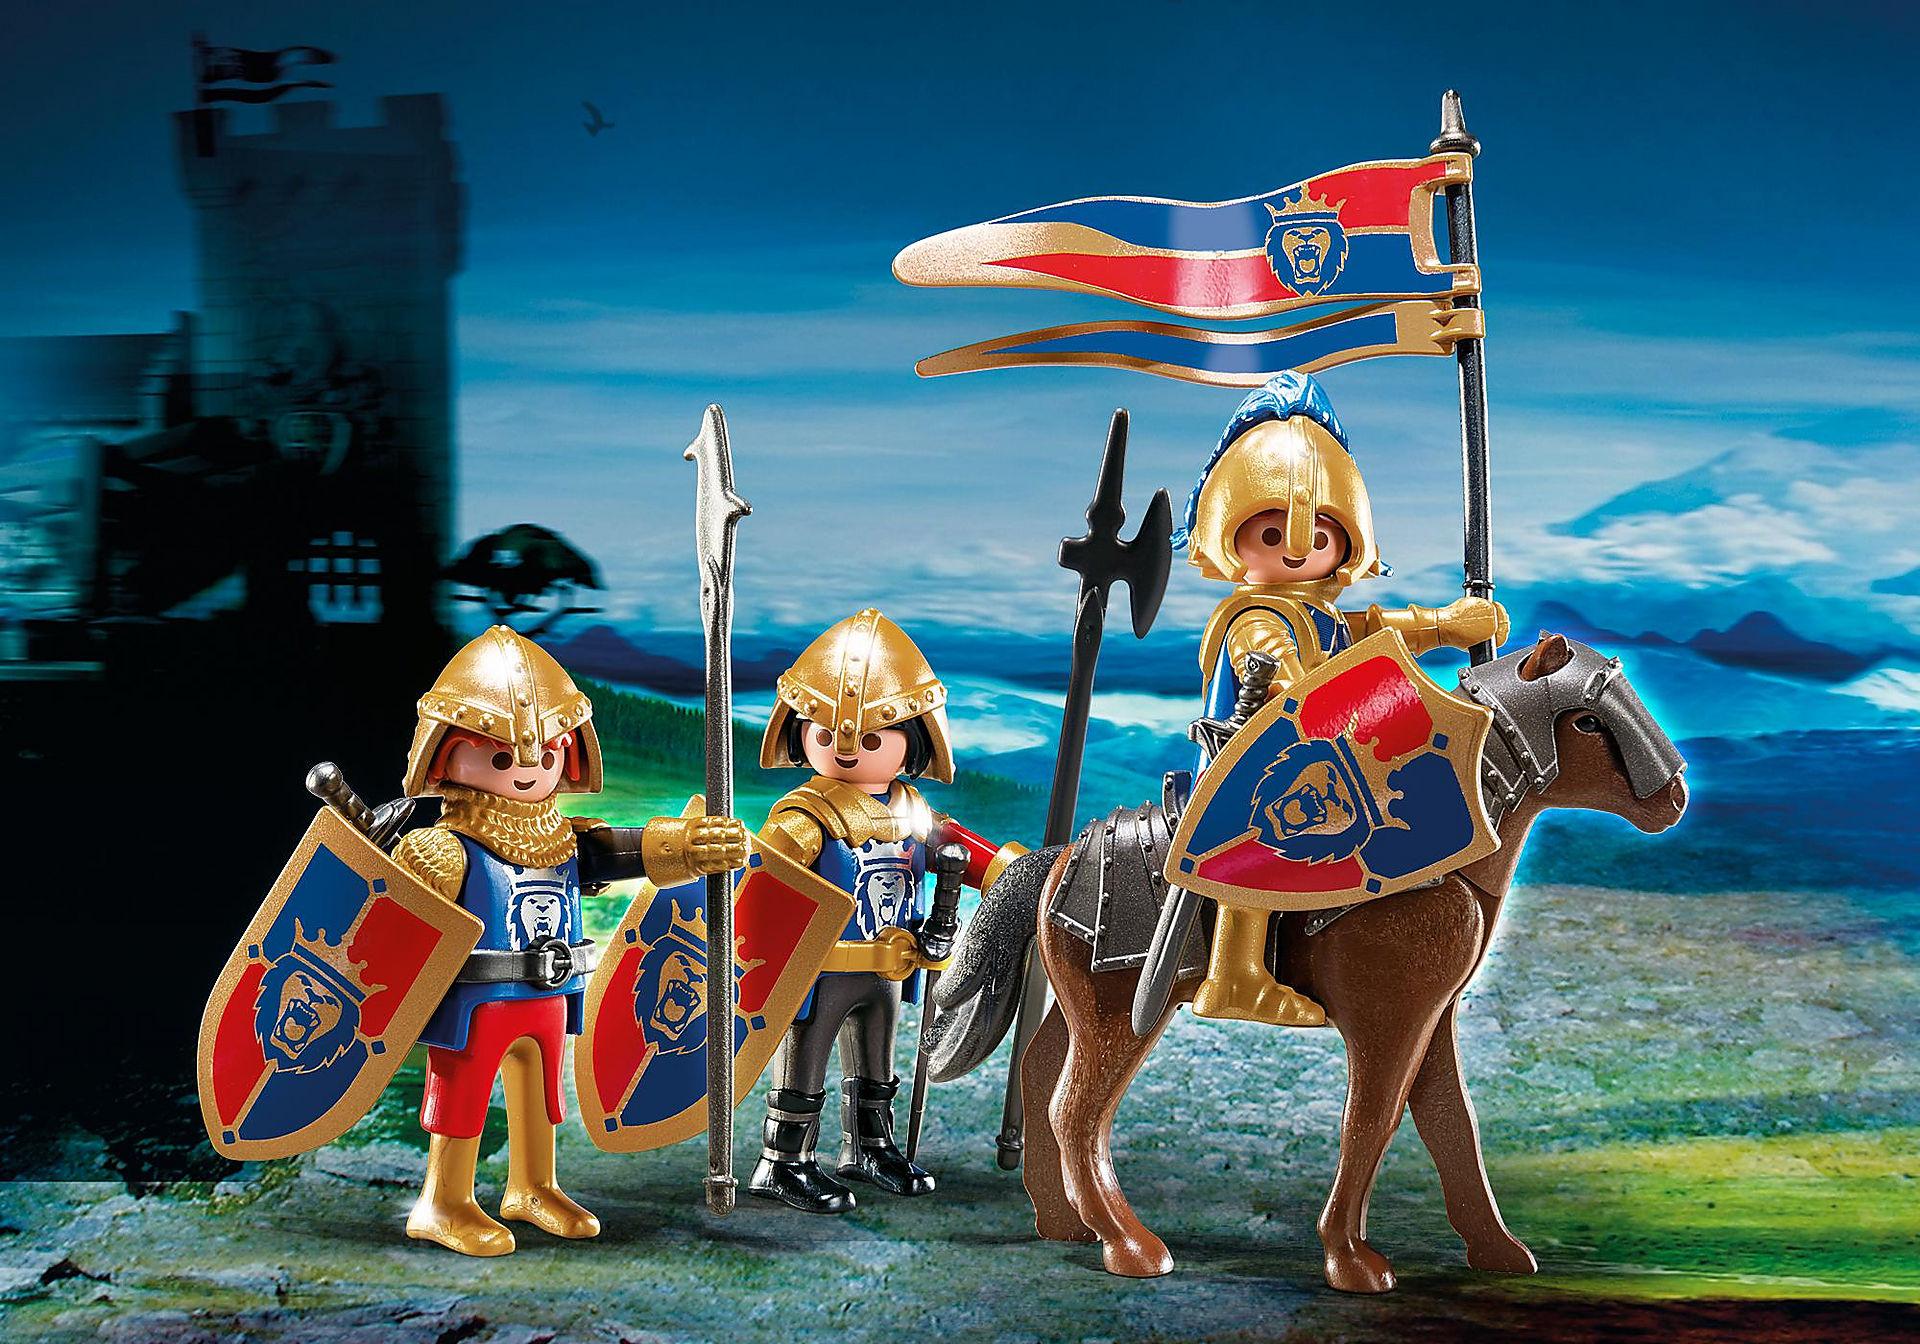 http://media.playmobil.com/i/playmobil/6006_product_detail/Royal Lion Knights